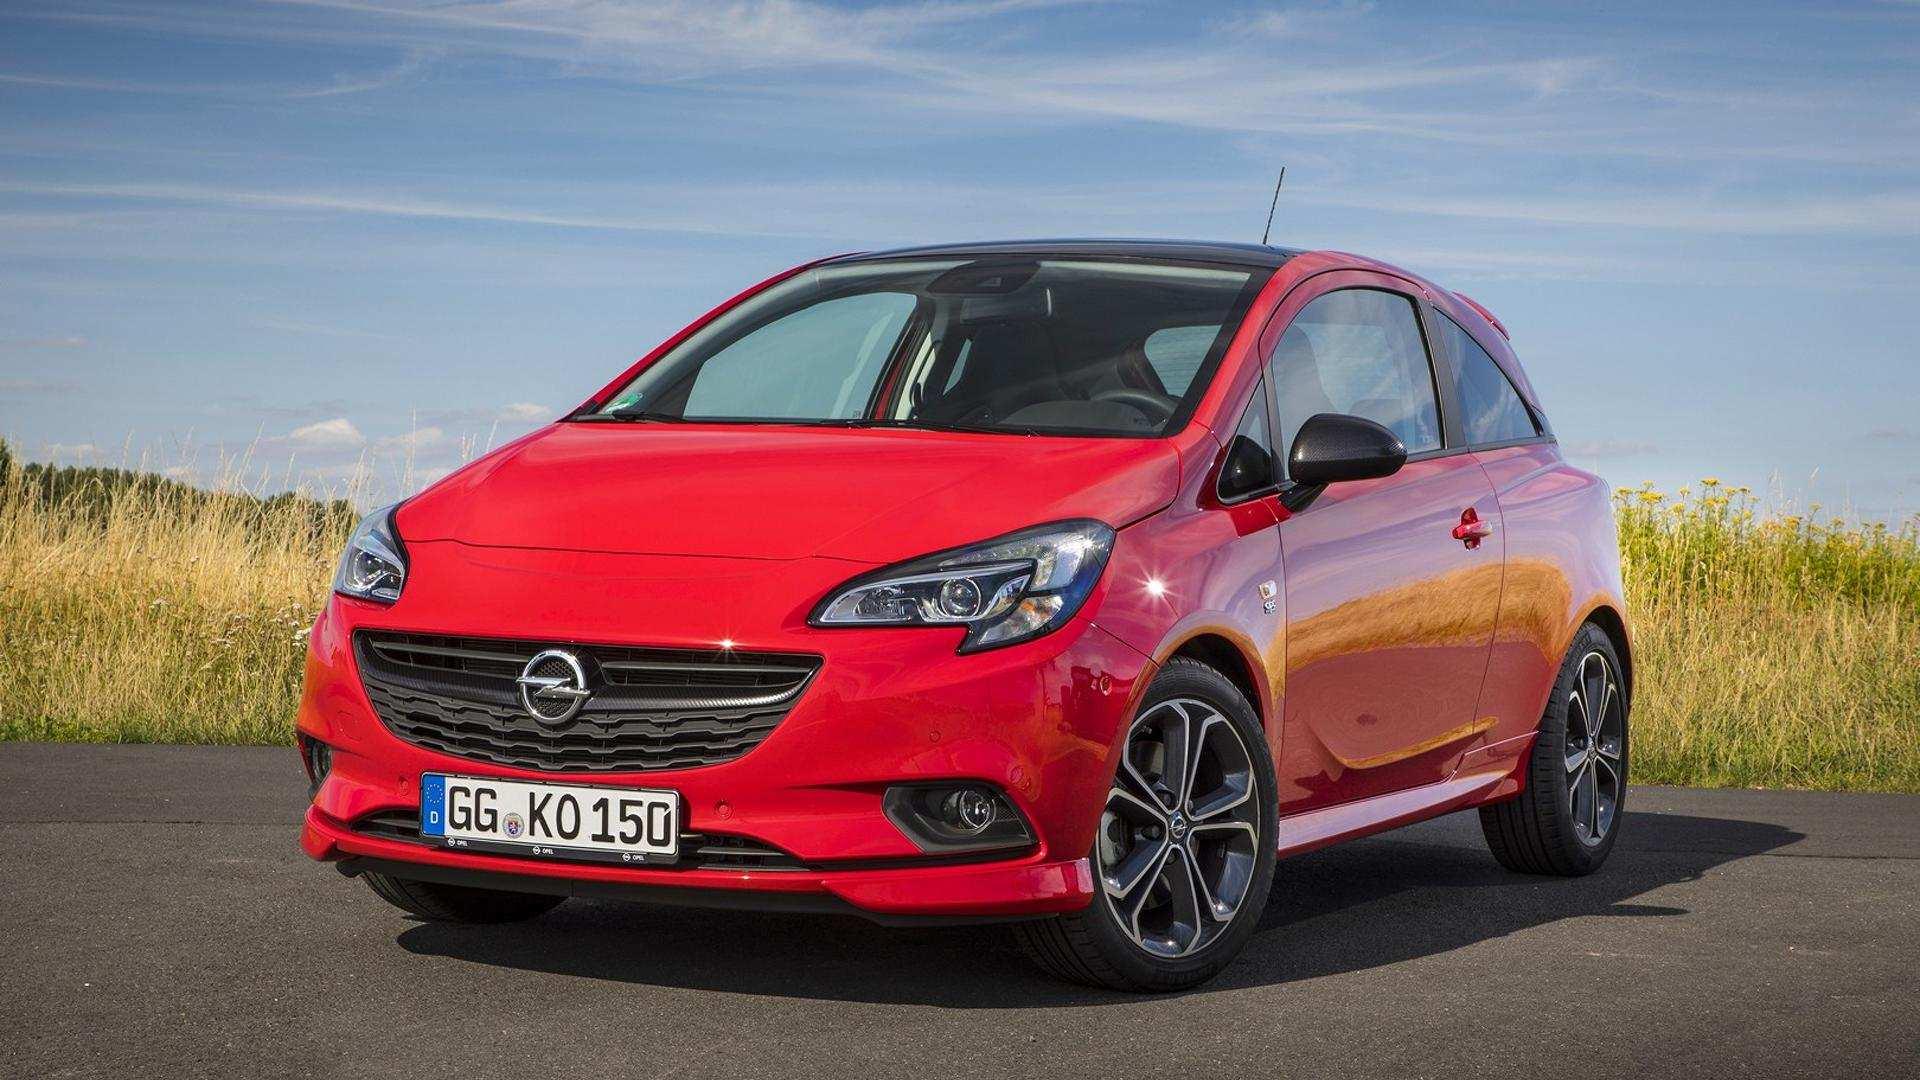 34 Best Review Opel Will Launch Corsa Ev In 2020 Reviews with Opel Will Launch Corsa Ev In 2020